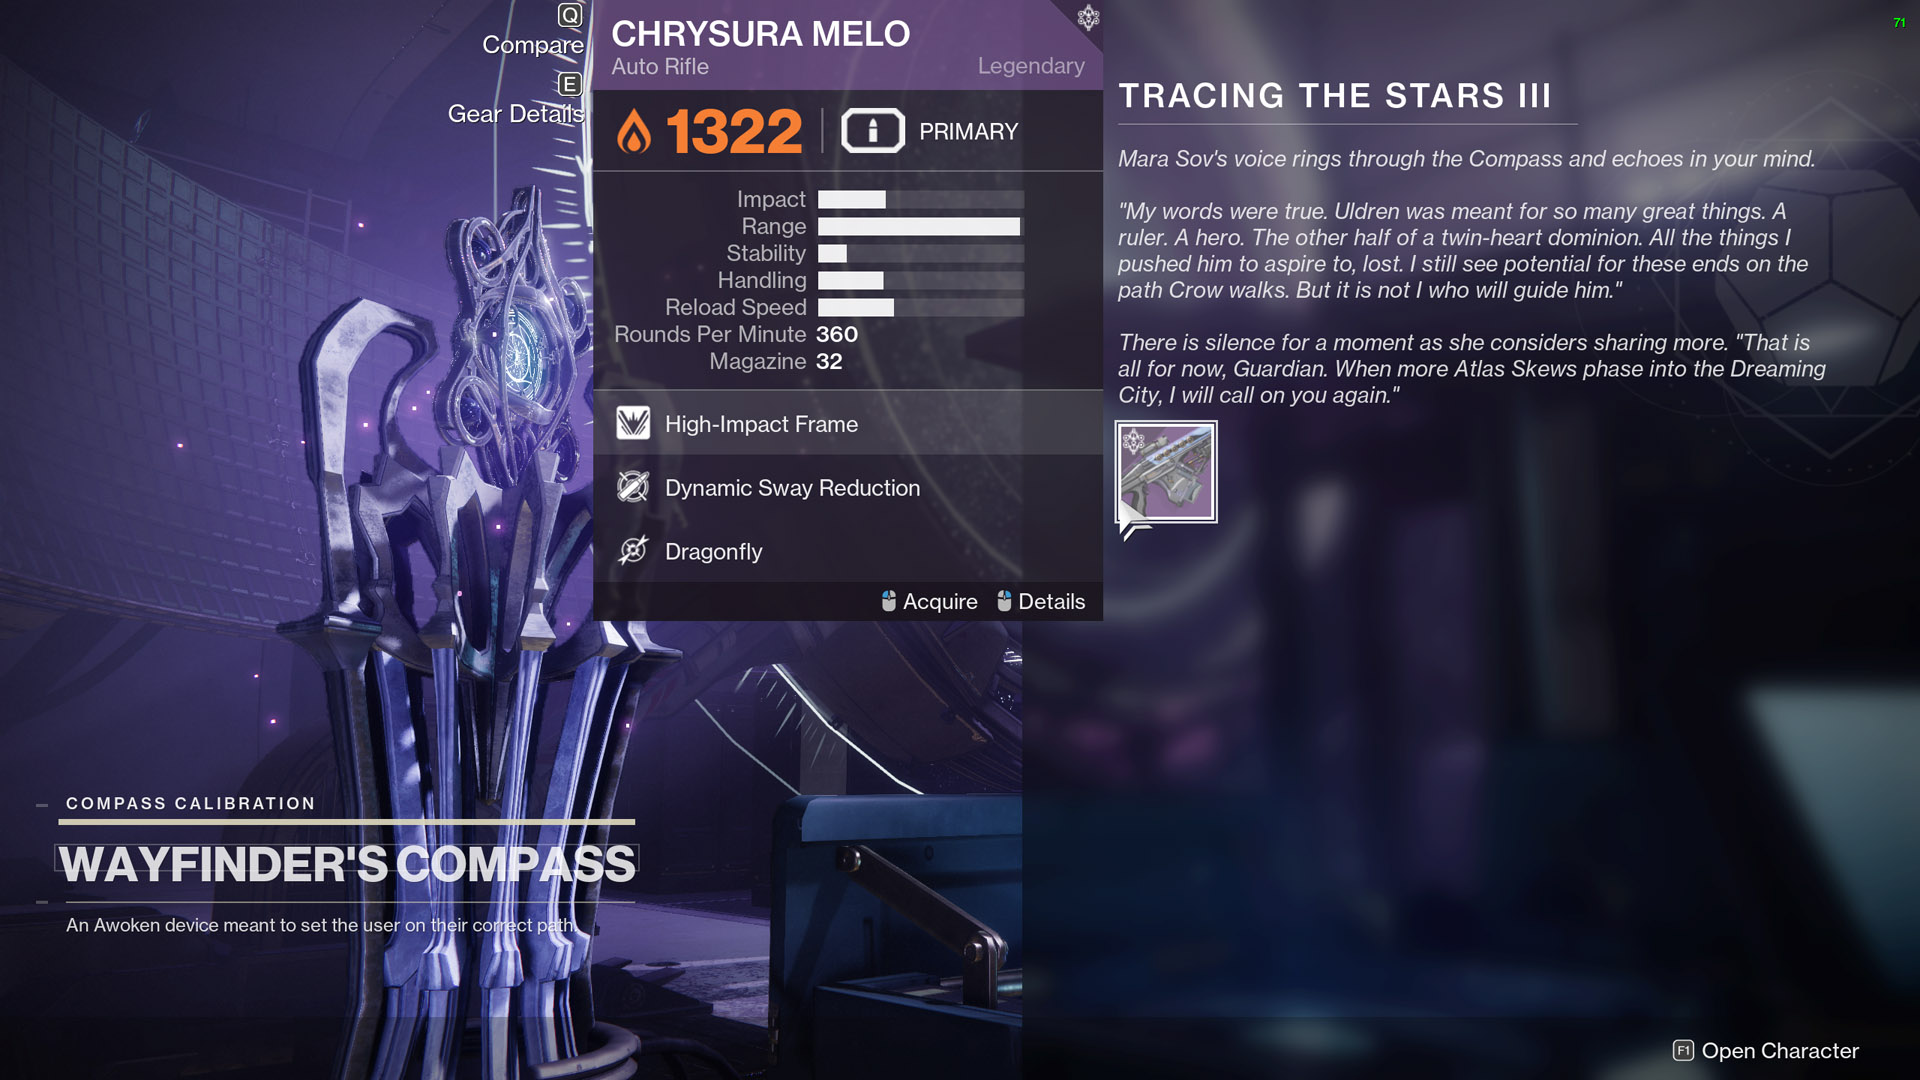 destiny 2 tracing the stars part 3 rewards